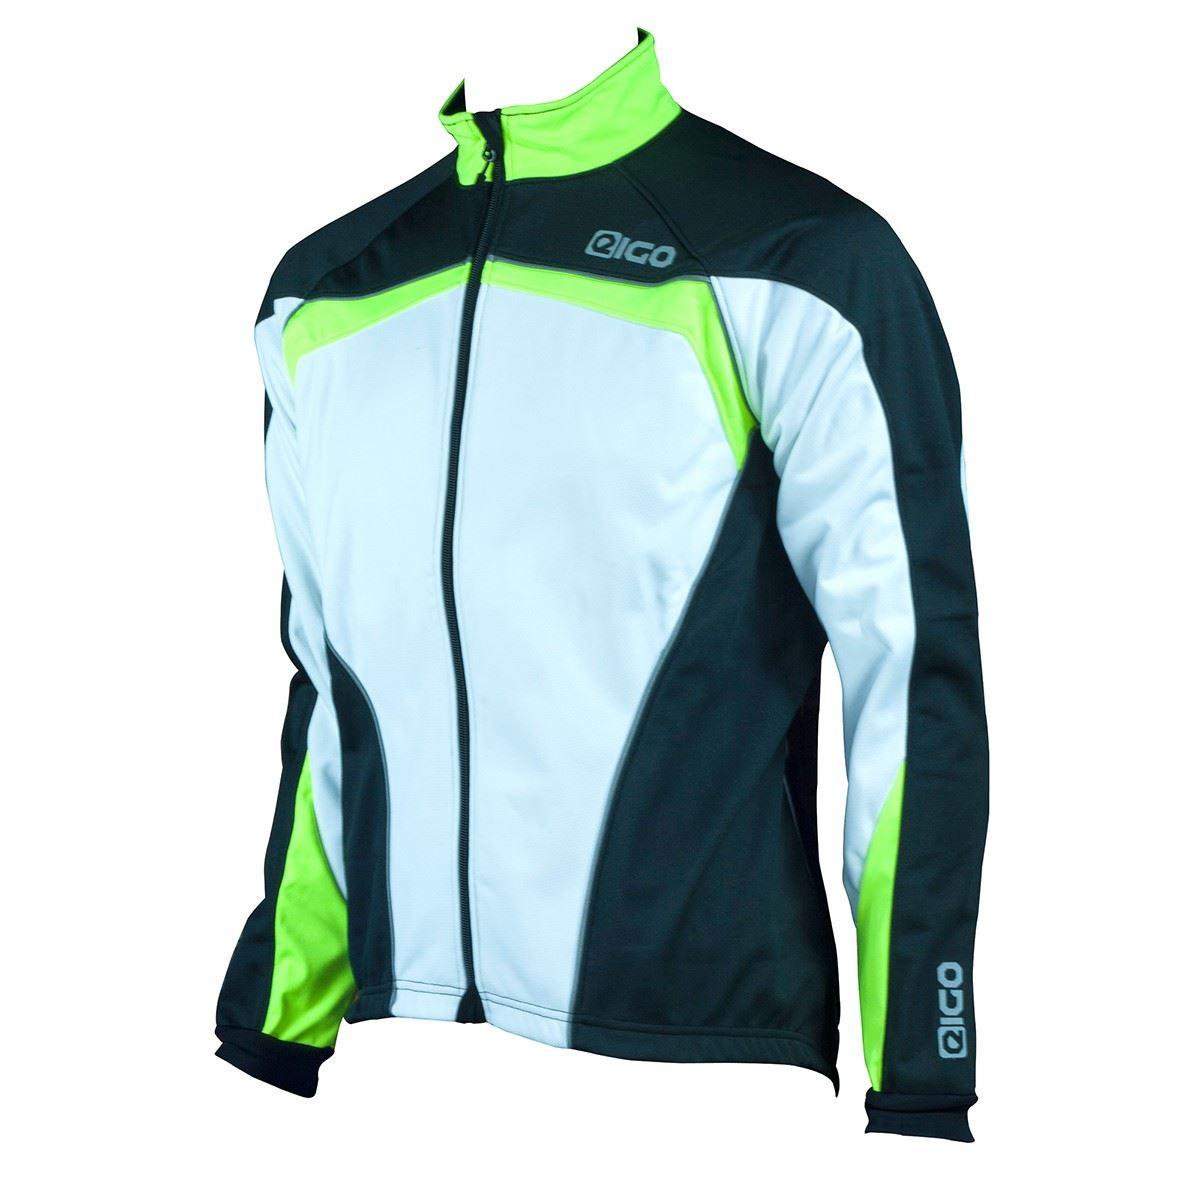 Bikeit Tissu Respirant Eigo Doublure Bora Doublure Eigo Polaire Coupe Vent Veste Cyclisme f25fb6